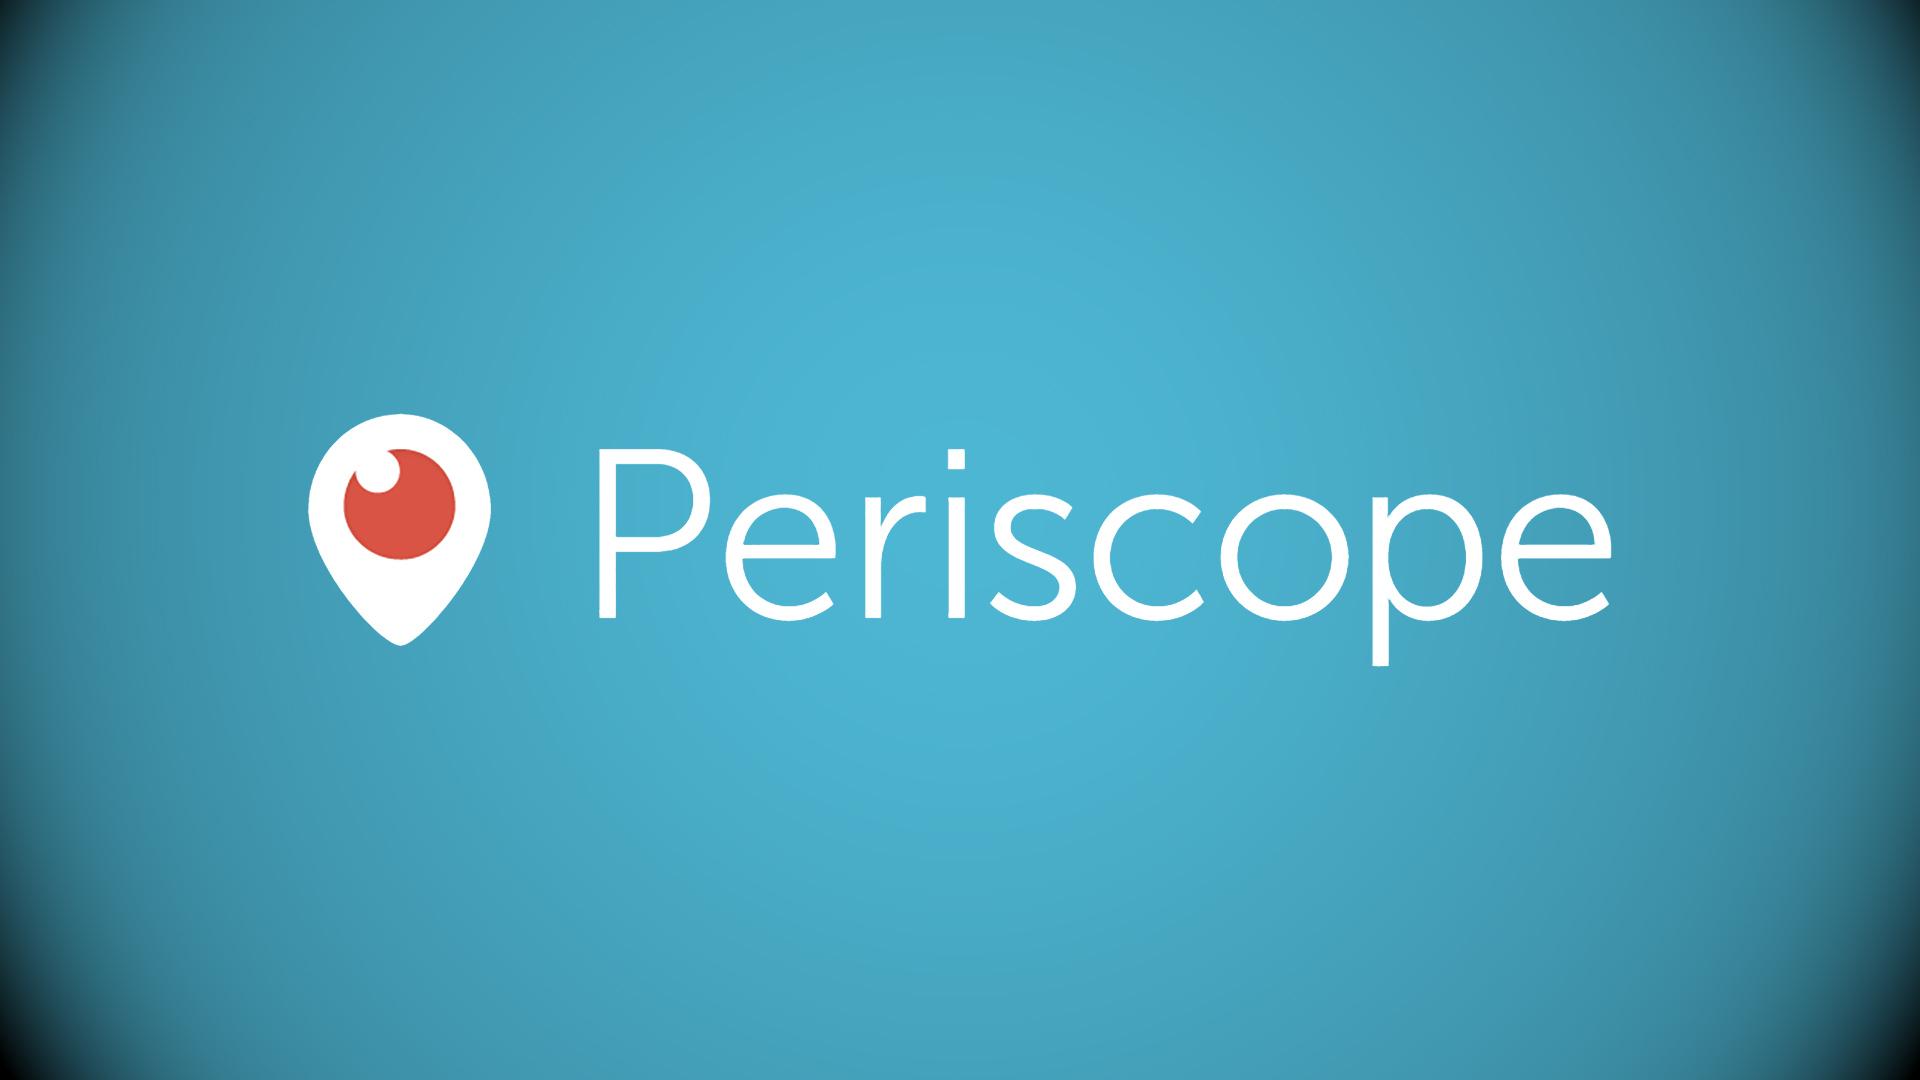 https://www.dotmug.net/wp-content/uploads/2015/04/periscope-logo-1920.jpg